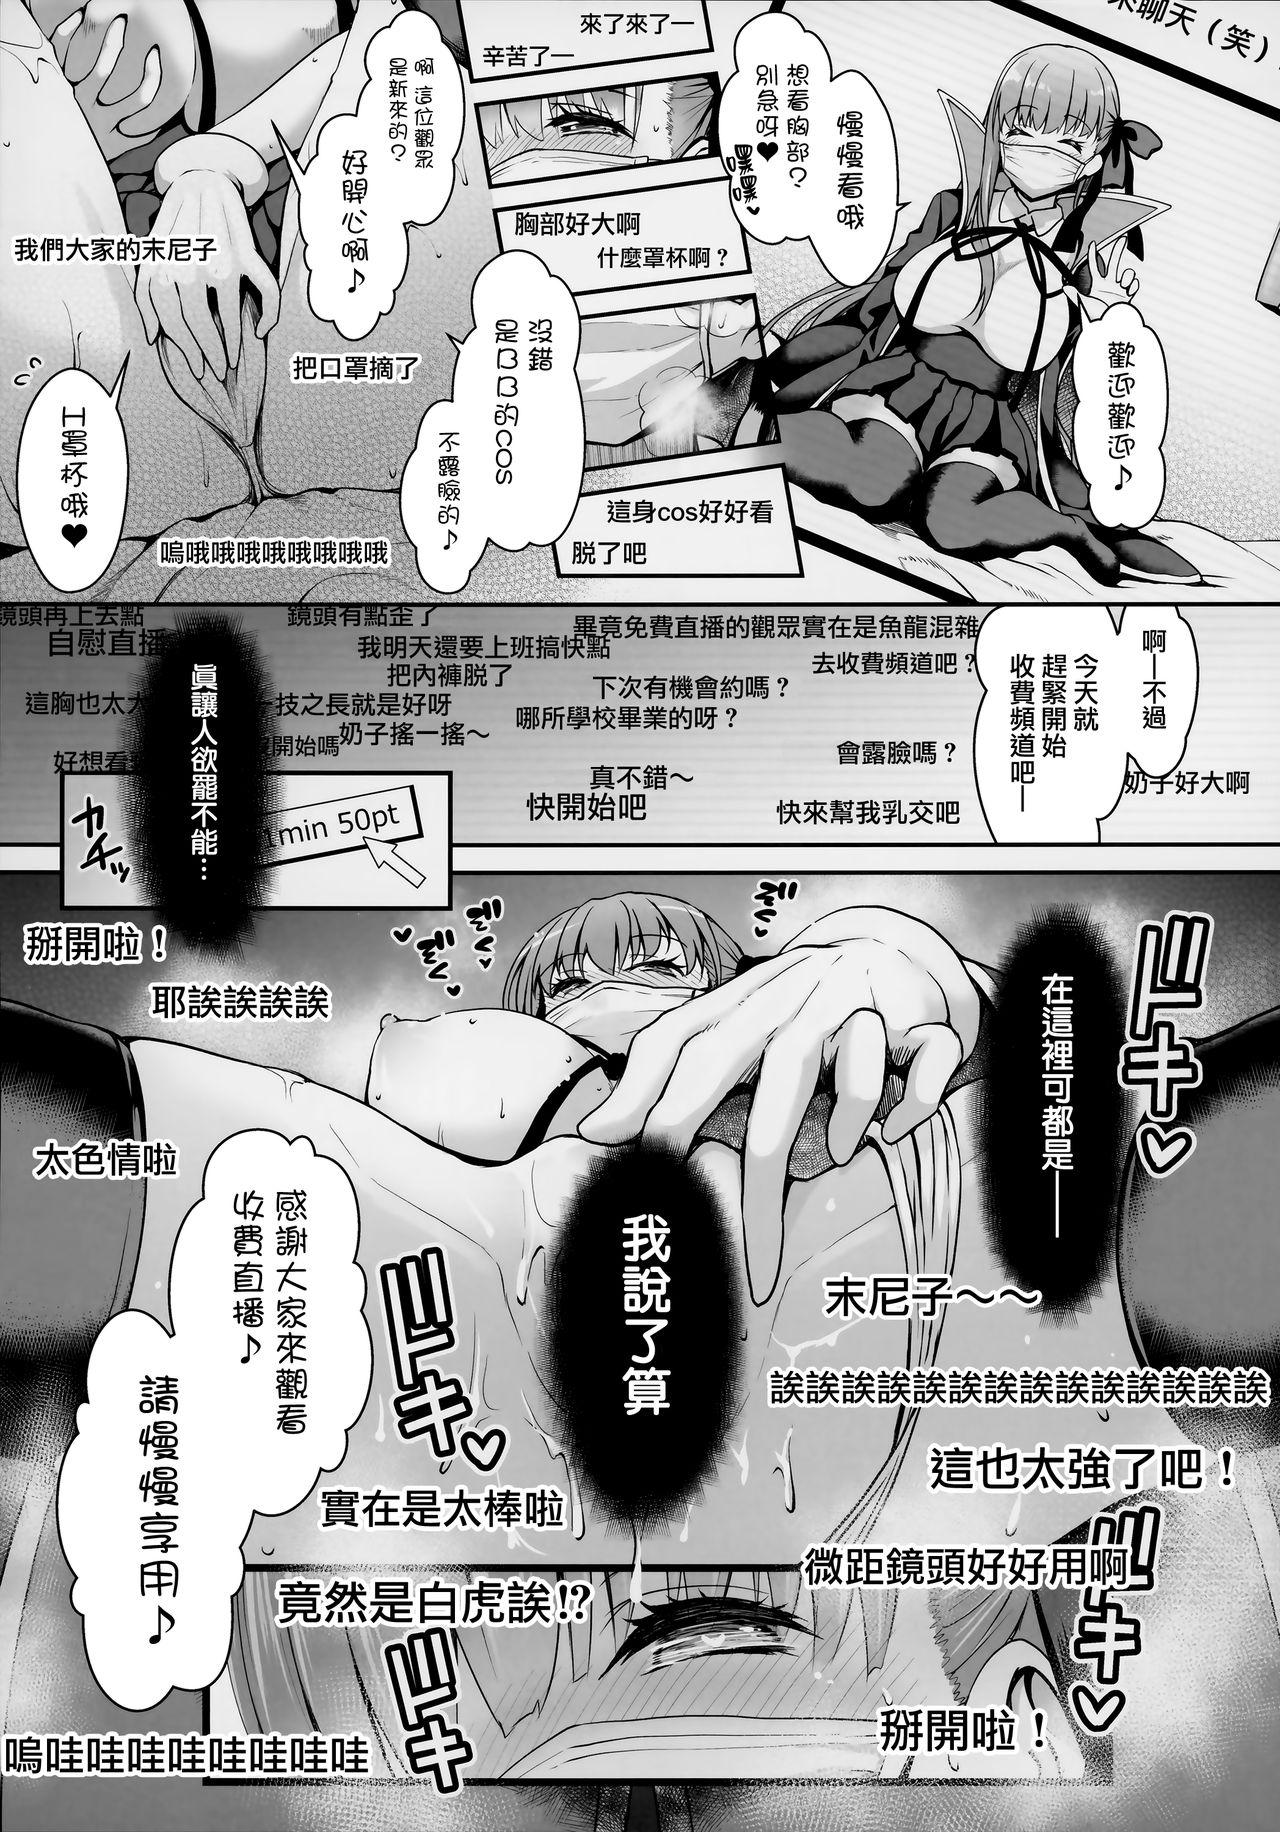 I-Cup Uraaka Shirouto Haishinsha Cosplay Namahame 5